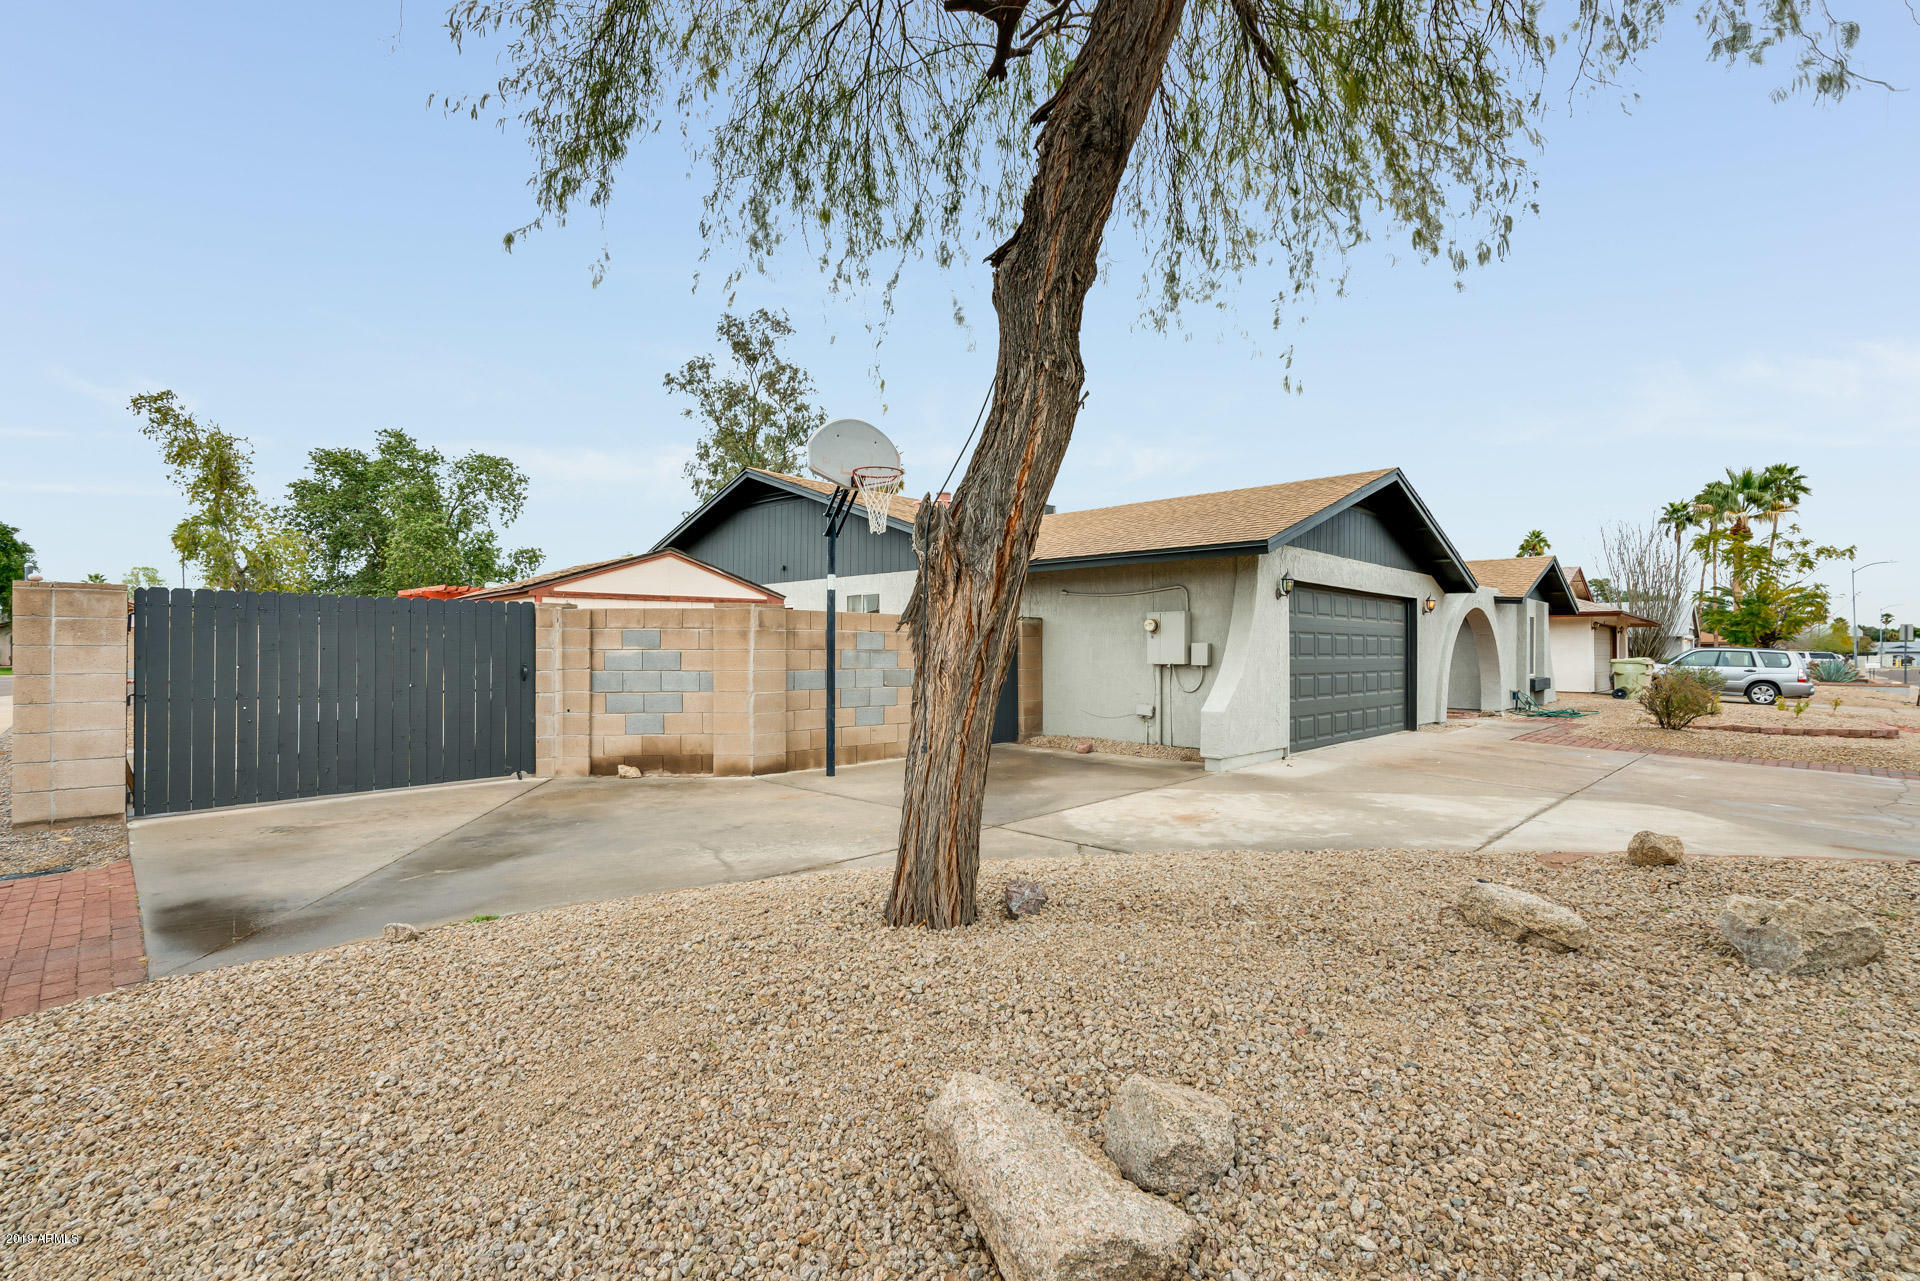 5744 W GREENBRIAR DRIVE, GLENDALE, AZ 85308